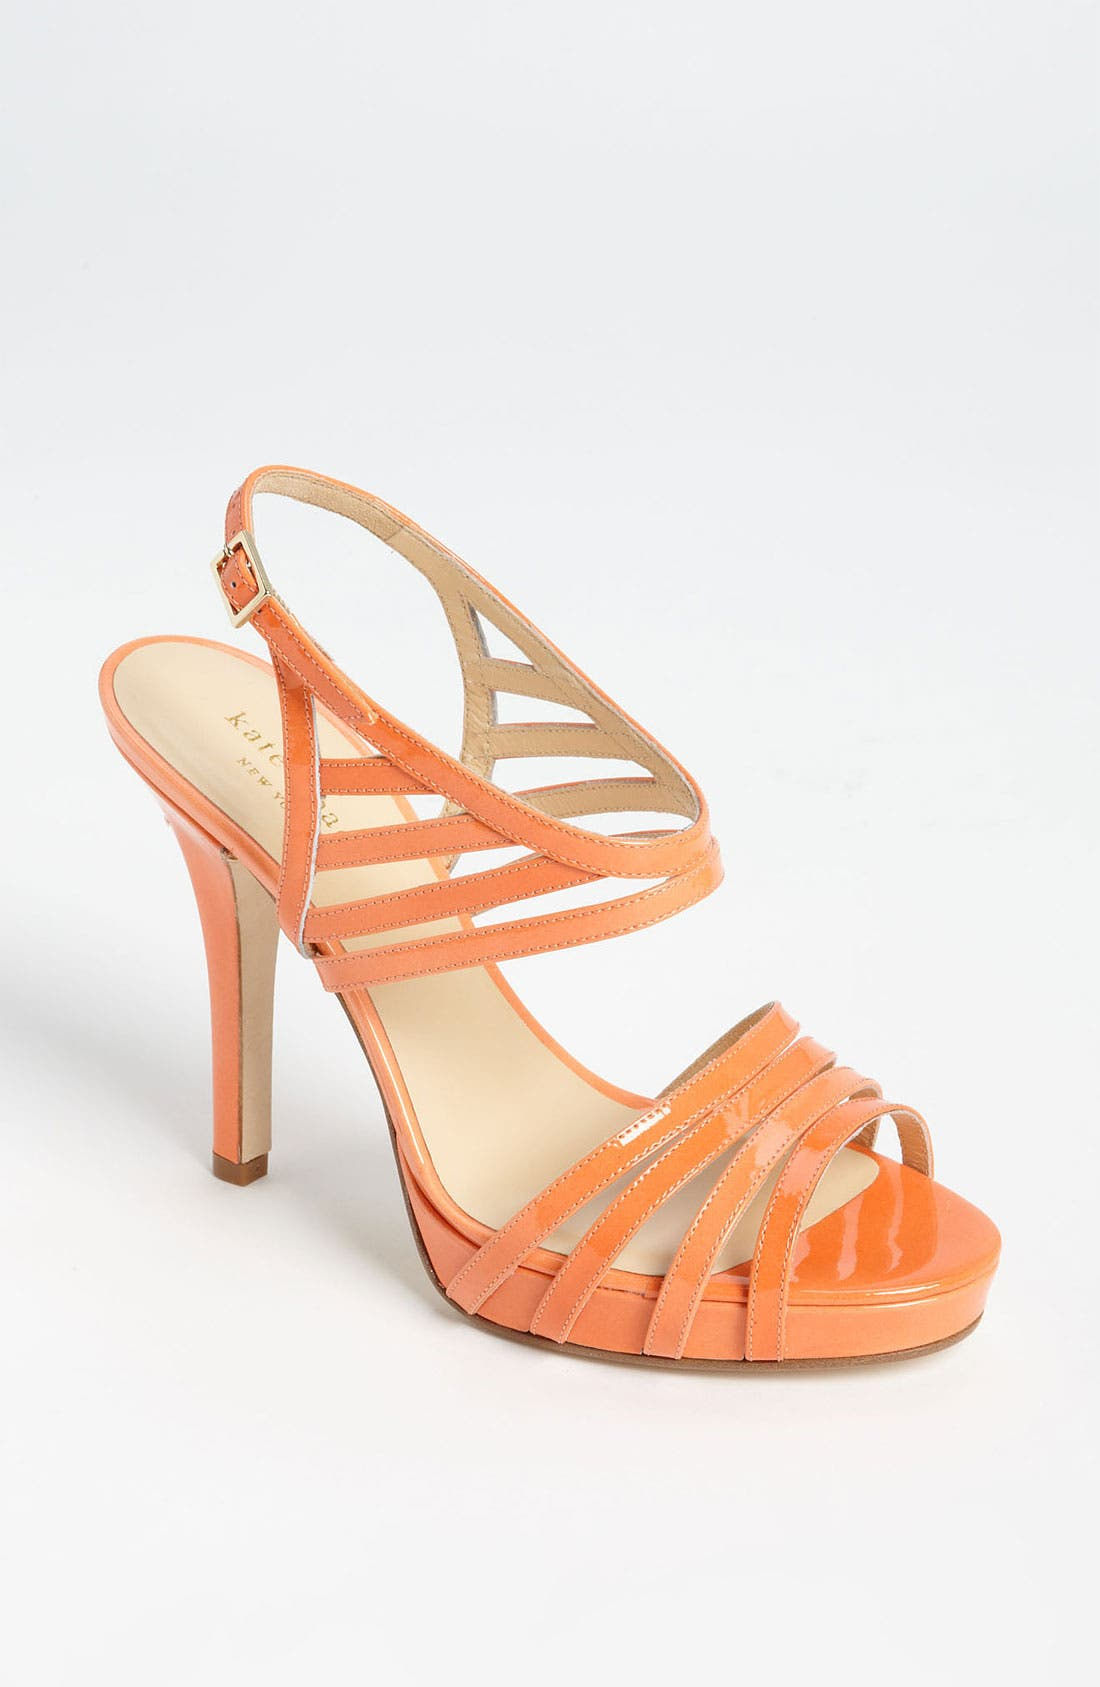 Main Image - kate spade new york 'raven' sandal